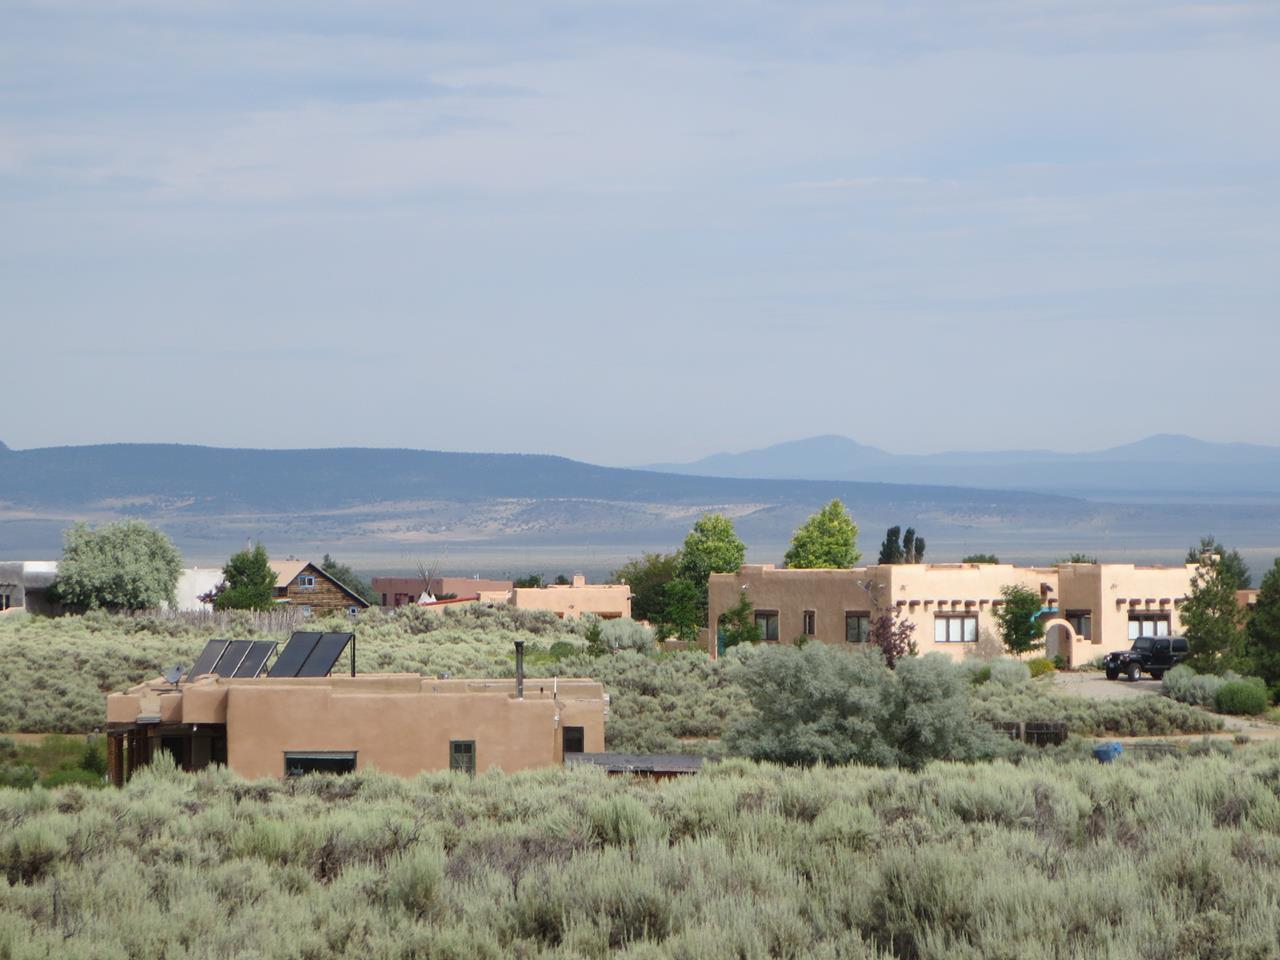 #Taos #Vista Linda #Big Sky #Taos #New #Mexico